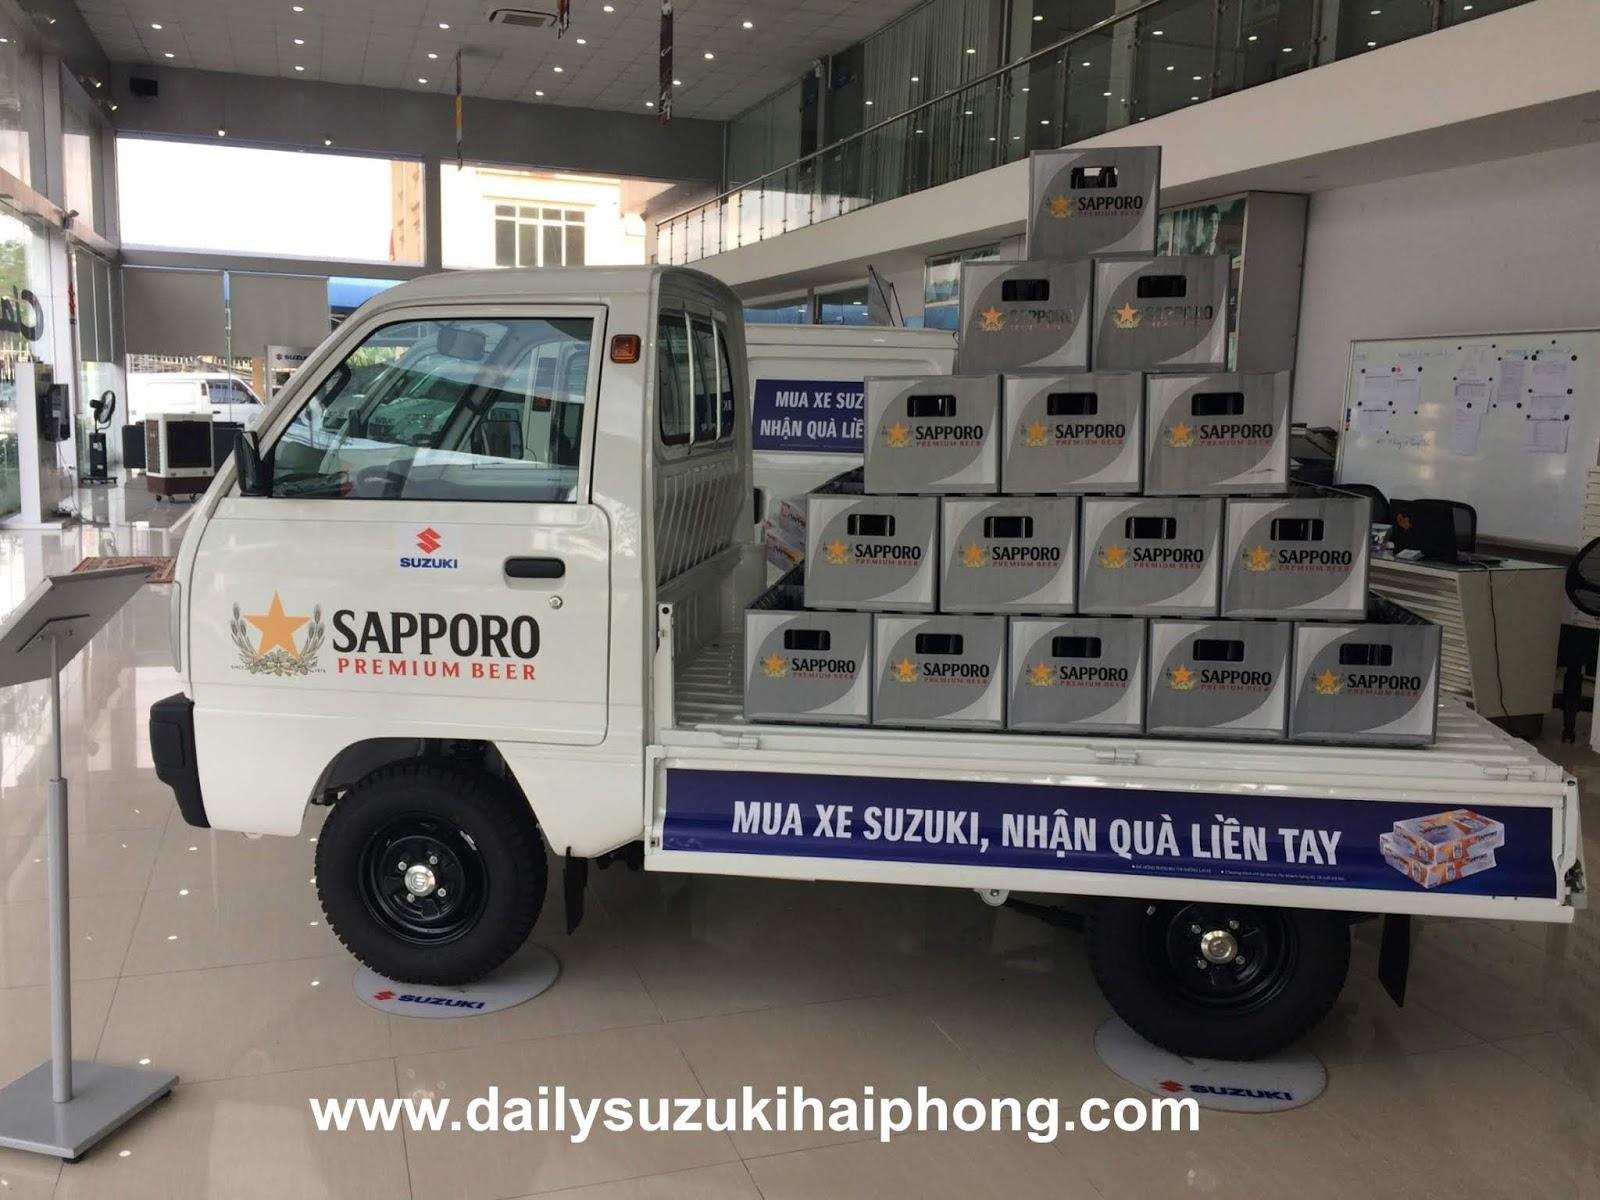 Xe tải Suzuki 5 tạ Hải Phòng